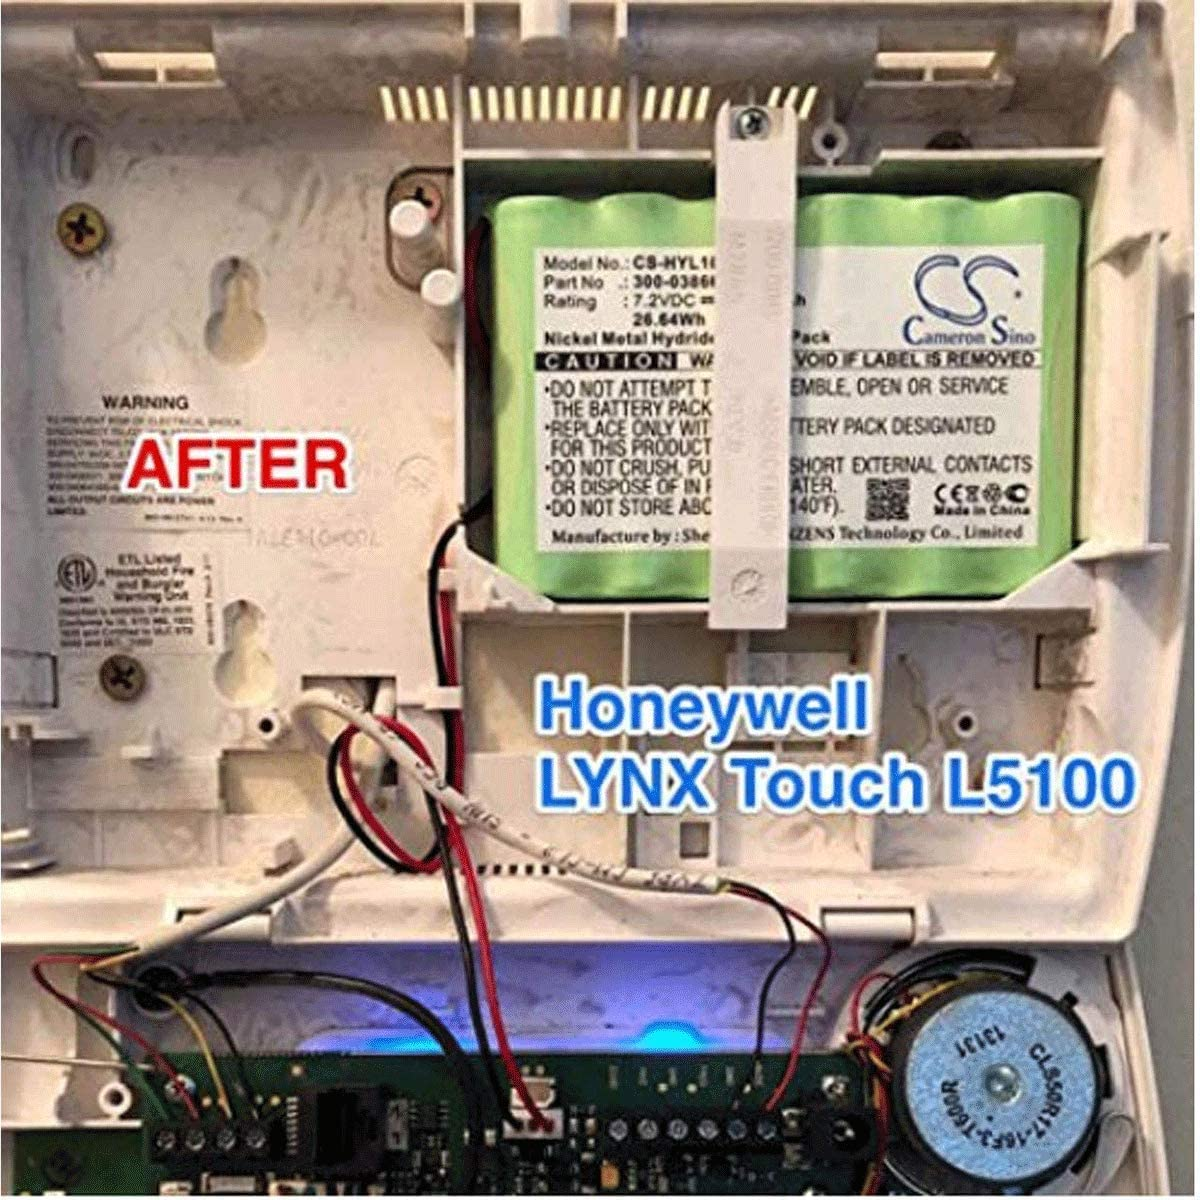 GLESOURCE 300-03864-1 1100mAh Backup Battery for ADT ADI Ademco Lynx WALYNX-RCHB-SC Honeywell Lynx Touch K5109 L5000 L5100 L3000